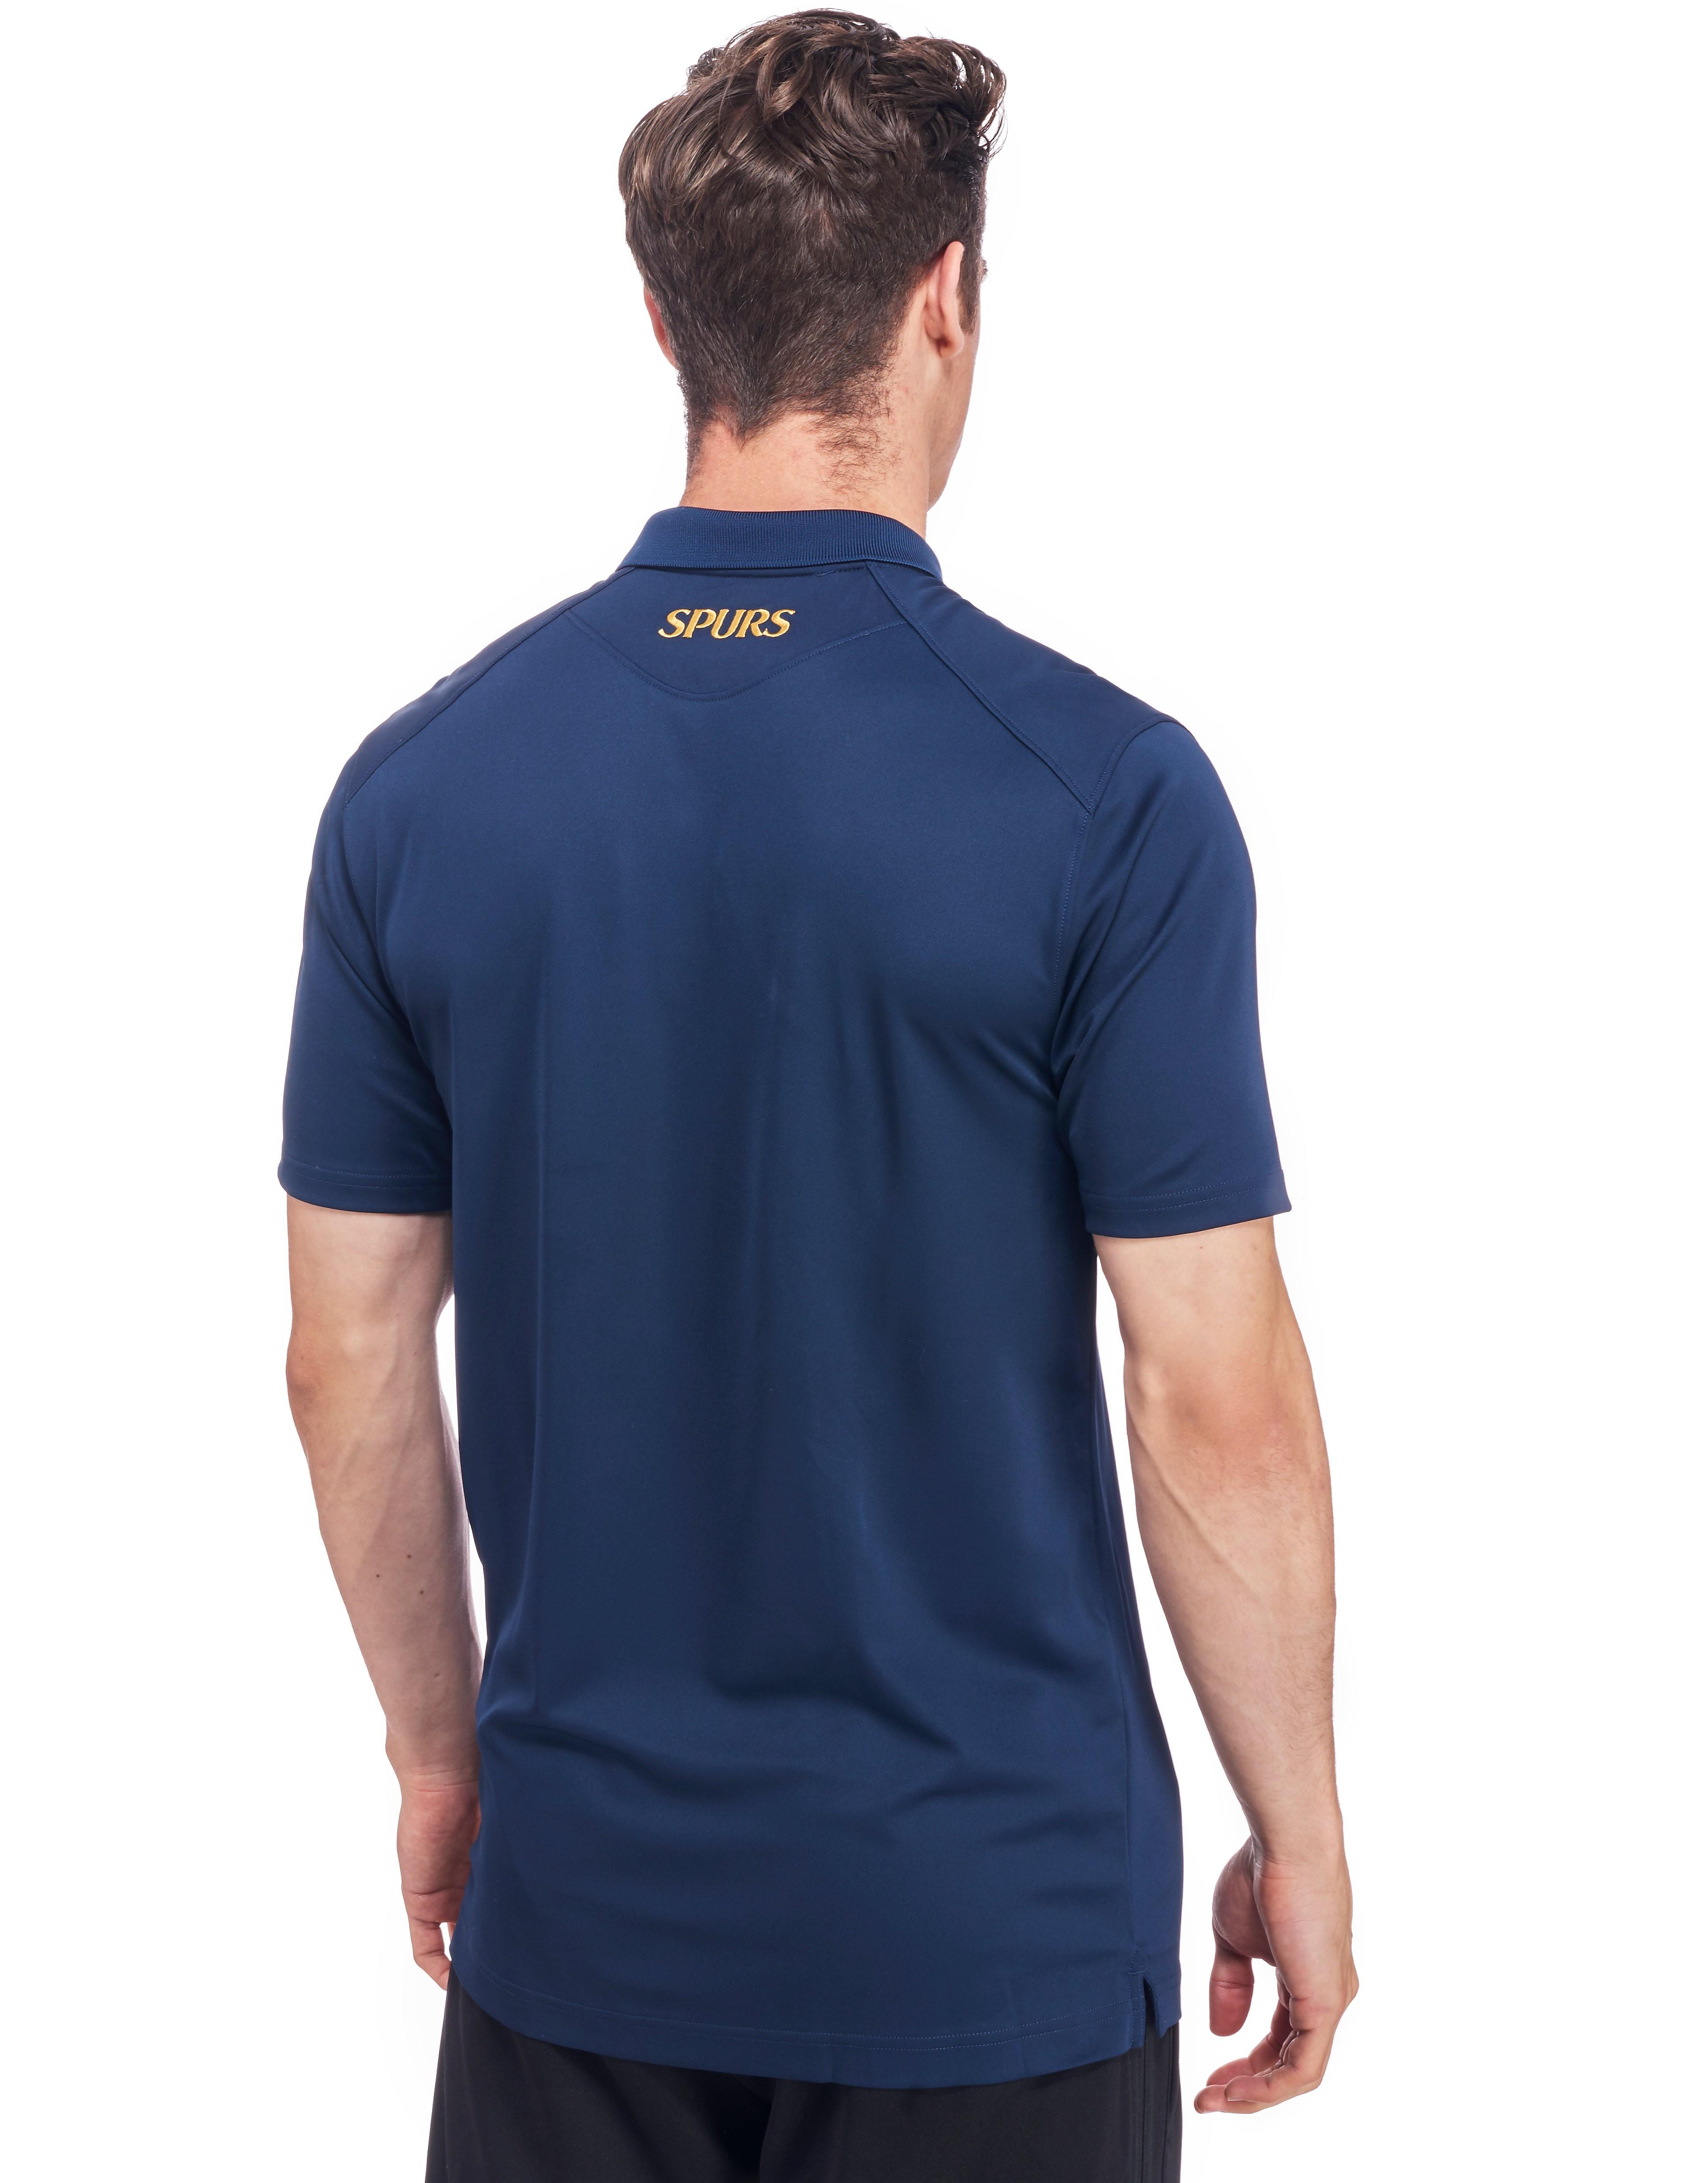 Under Armour Tottenham Hotspur 2016/17 Team Polo Shirt